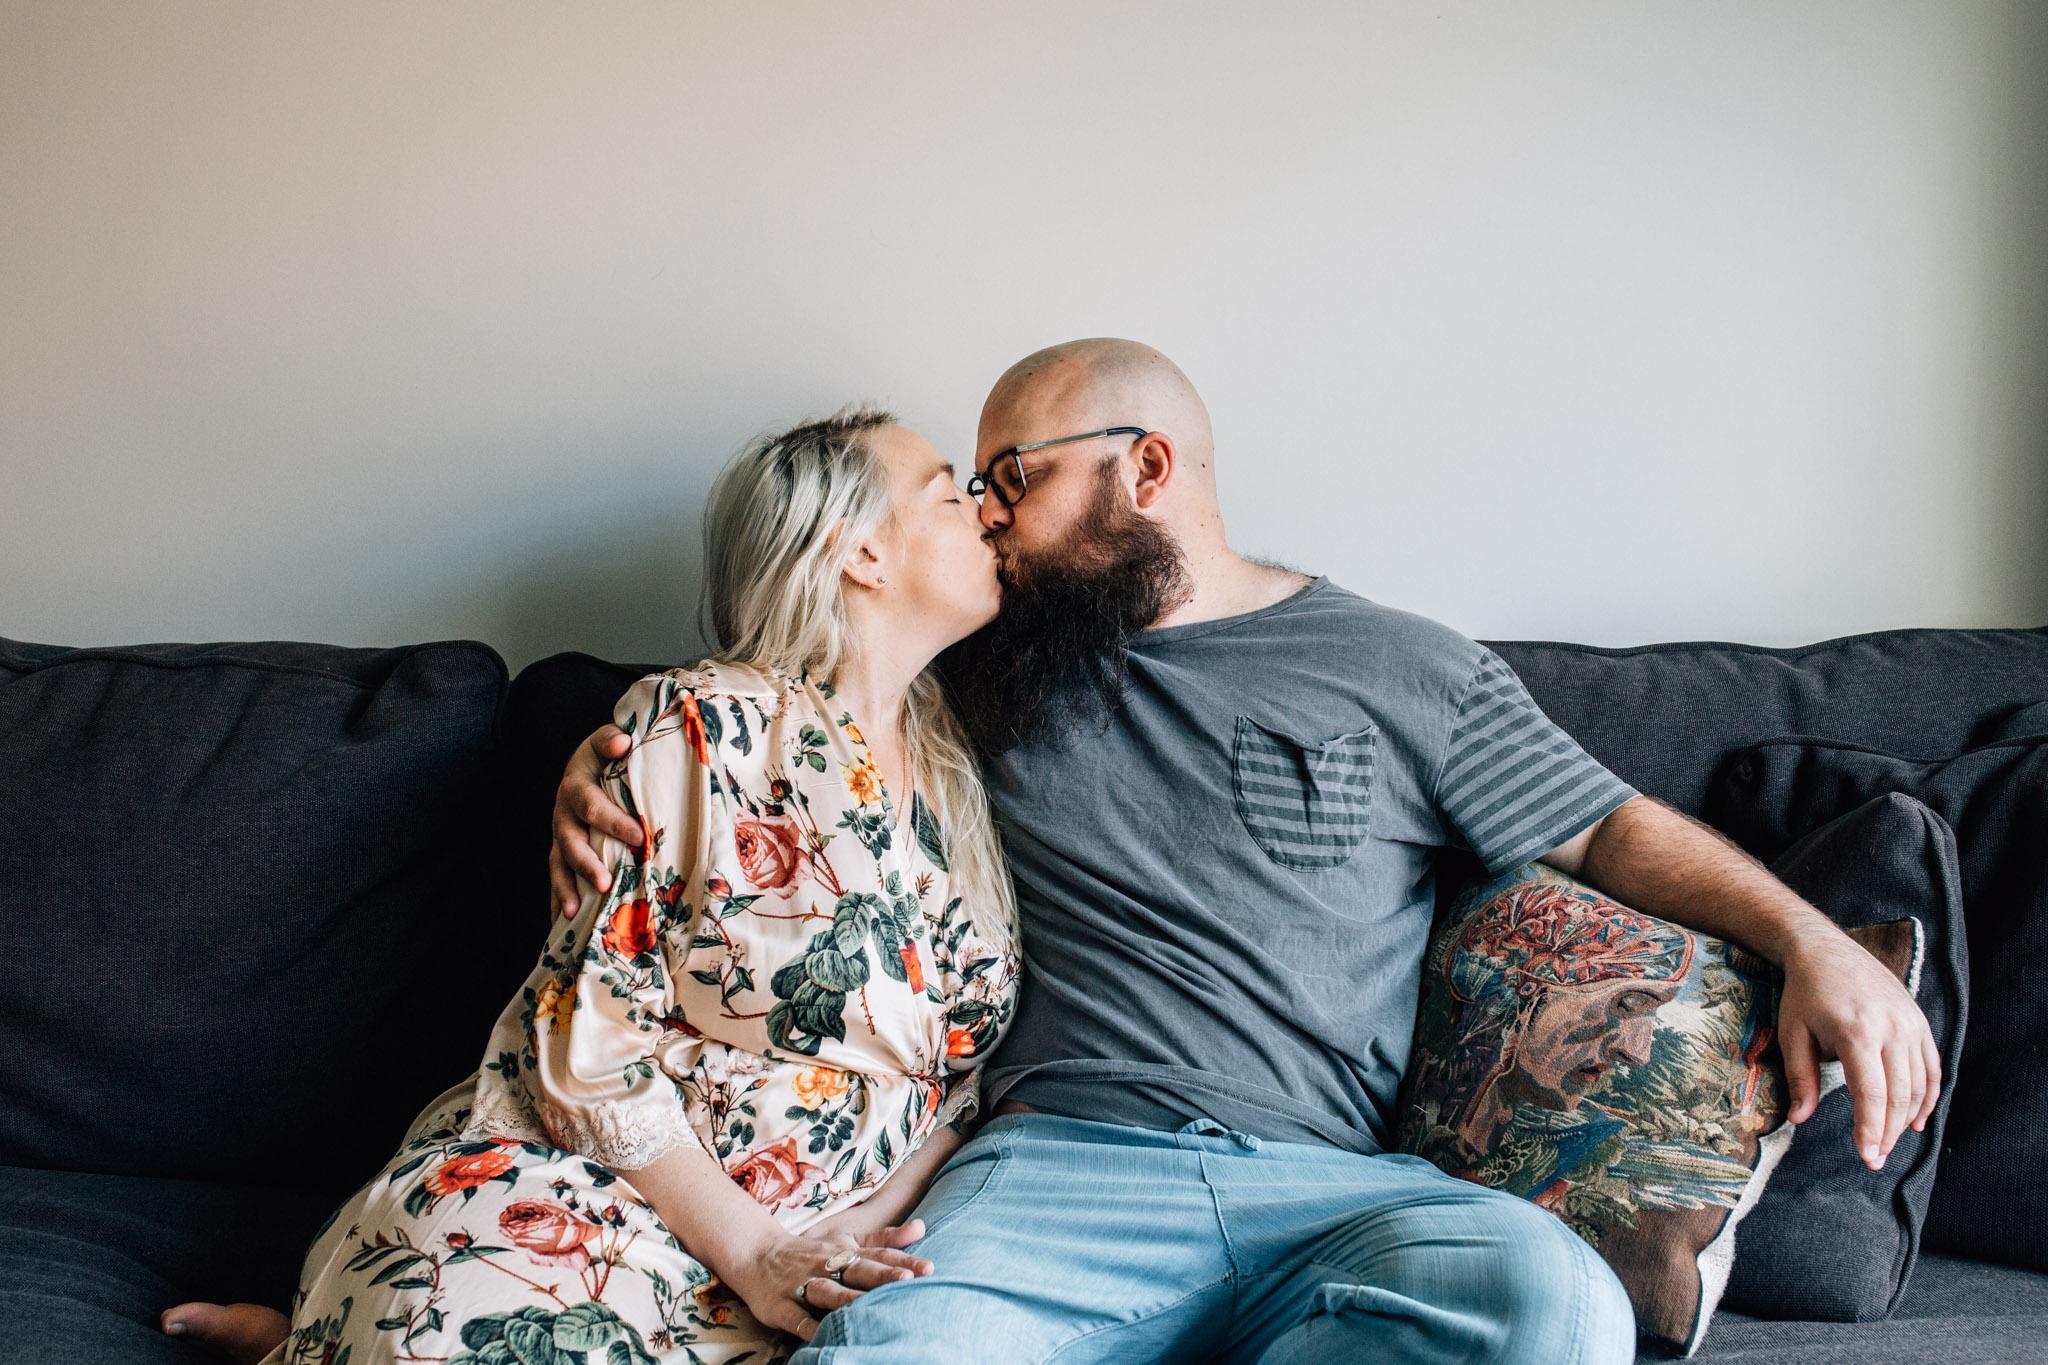 man-and-woman-kissing-on-sofa (1 of 1).jpg